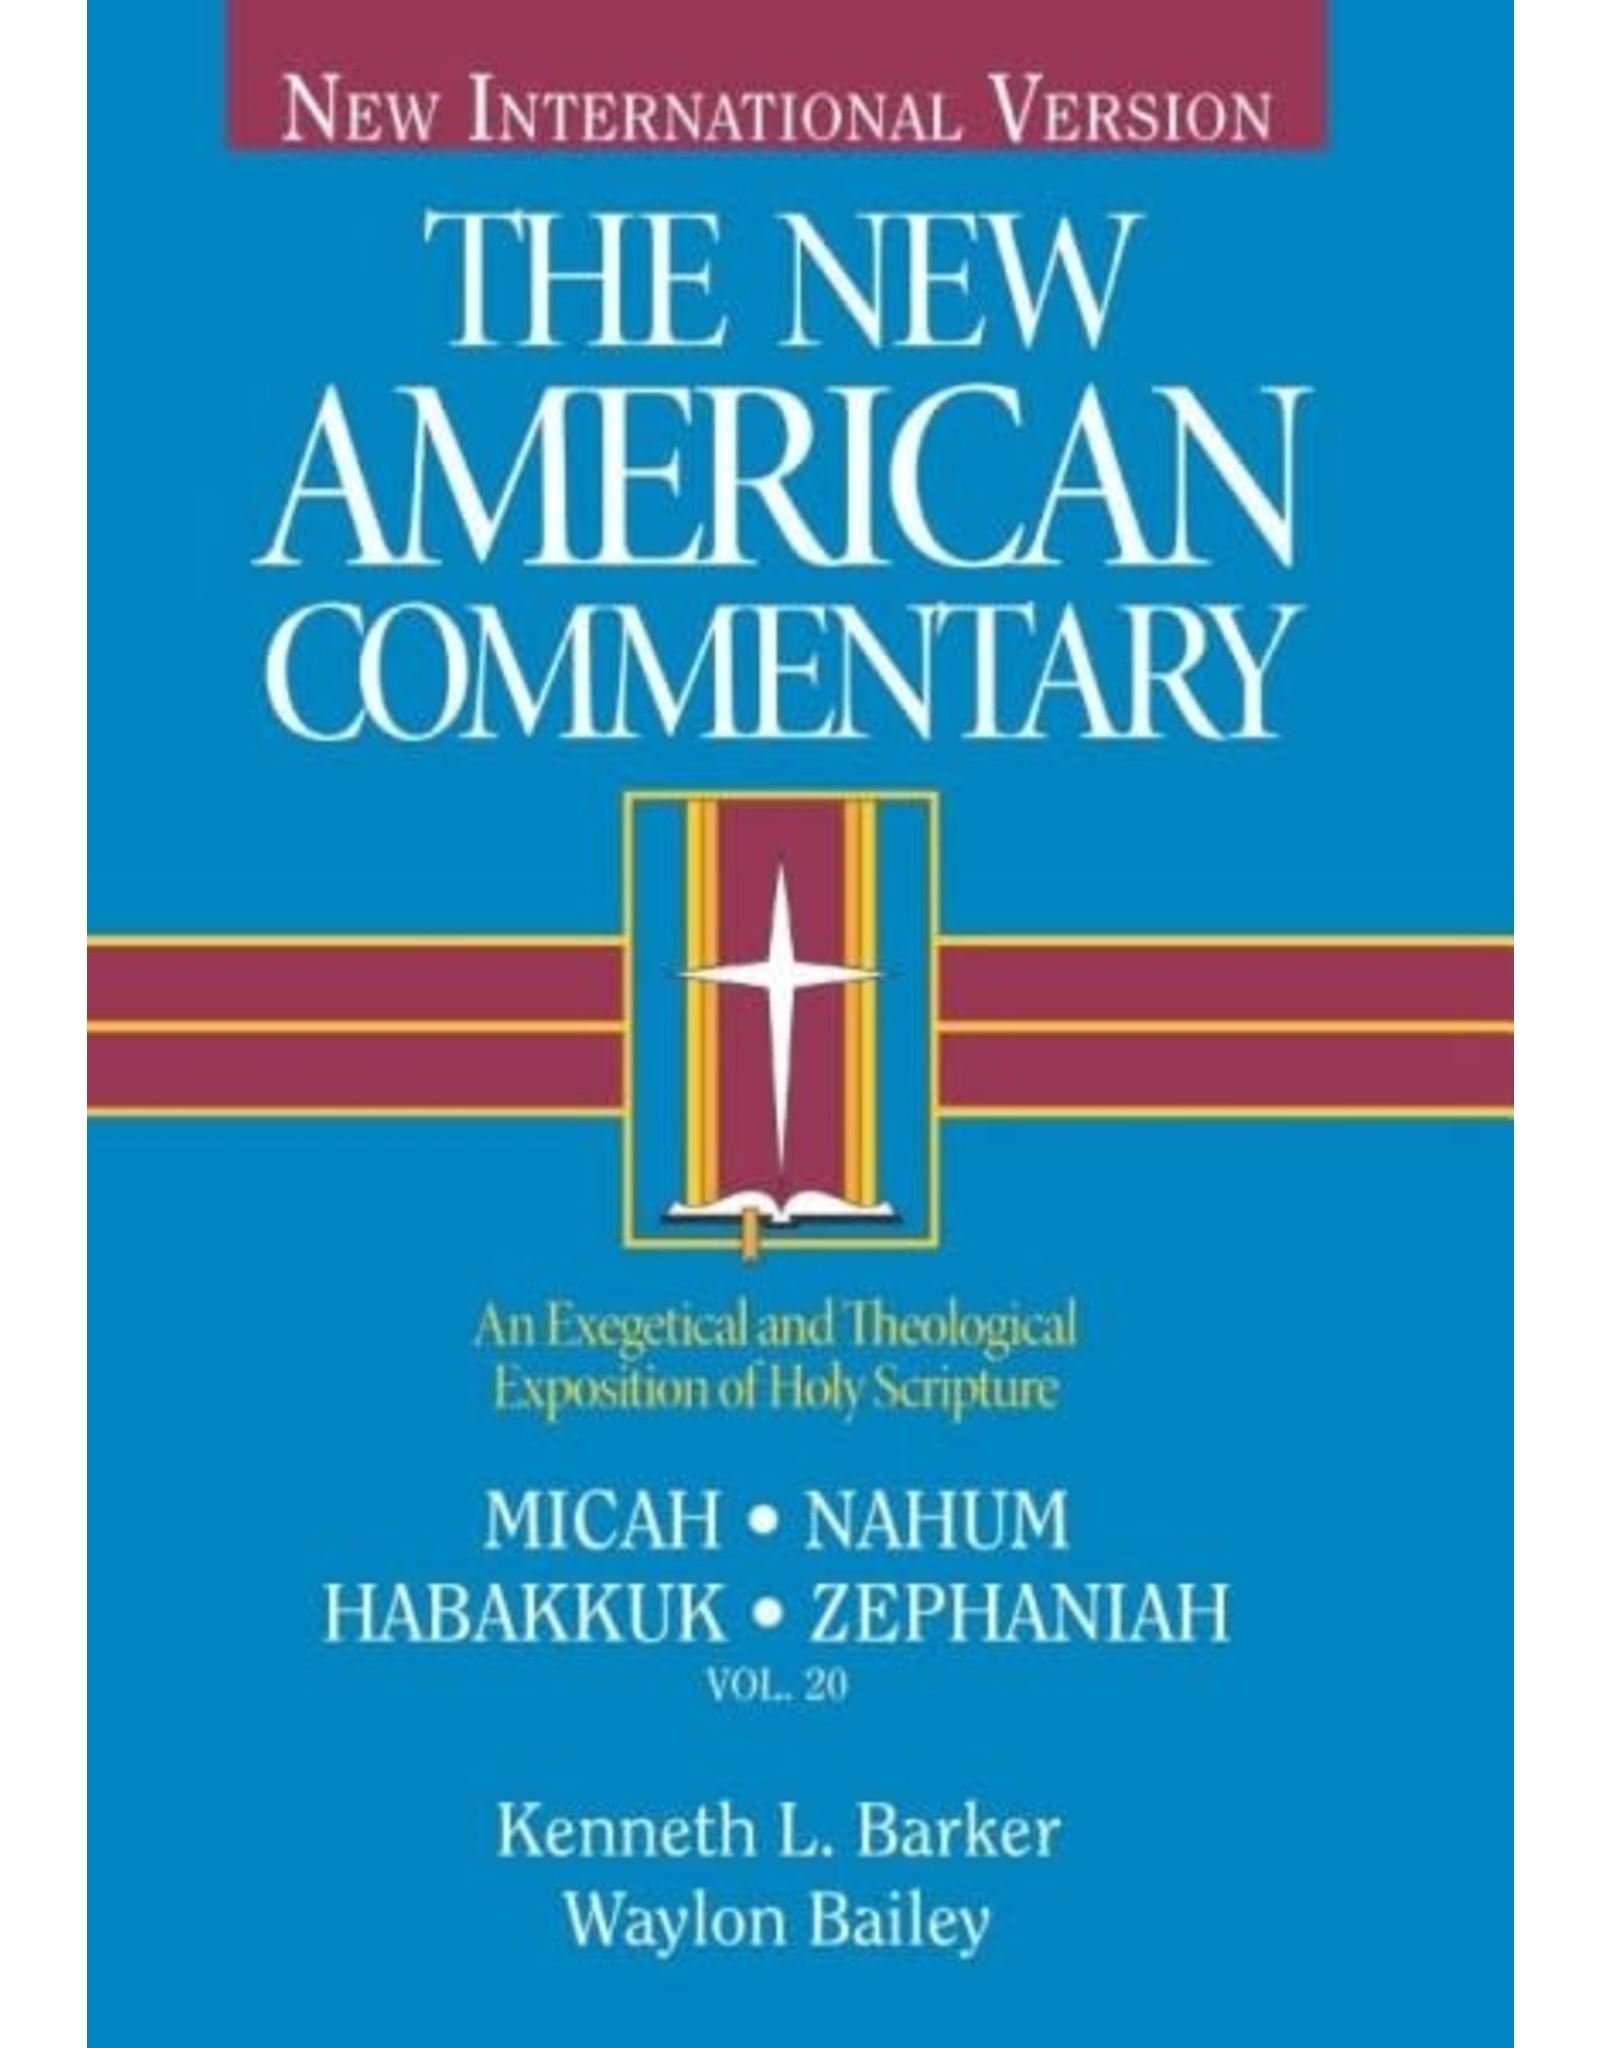 Barley New American Commentary - Micah, Nahum, Habakkuk, Zephaniah